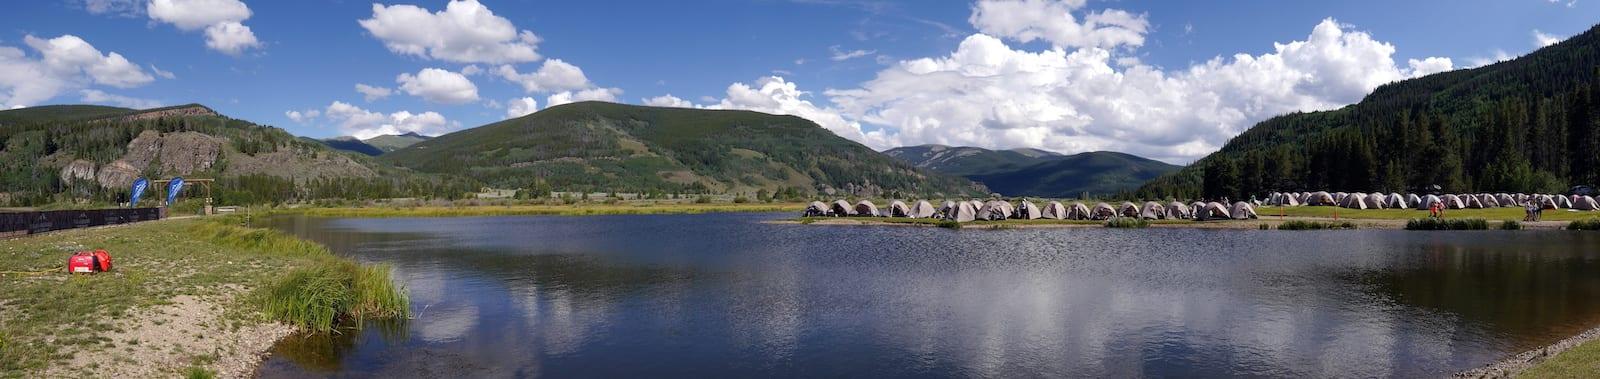 Nova Guides Camp Hale, CO